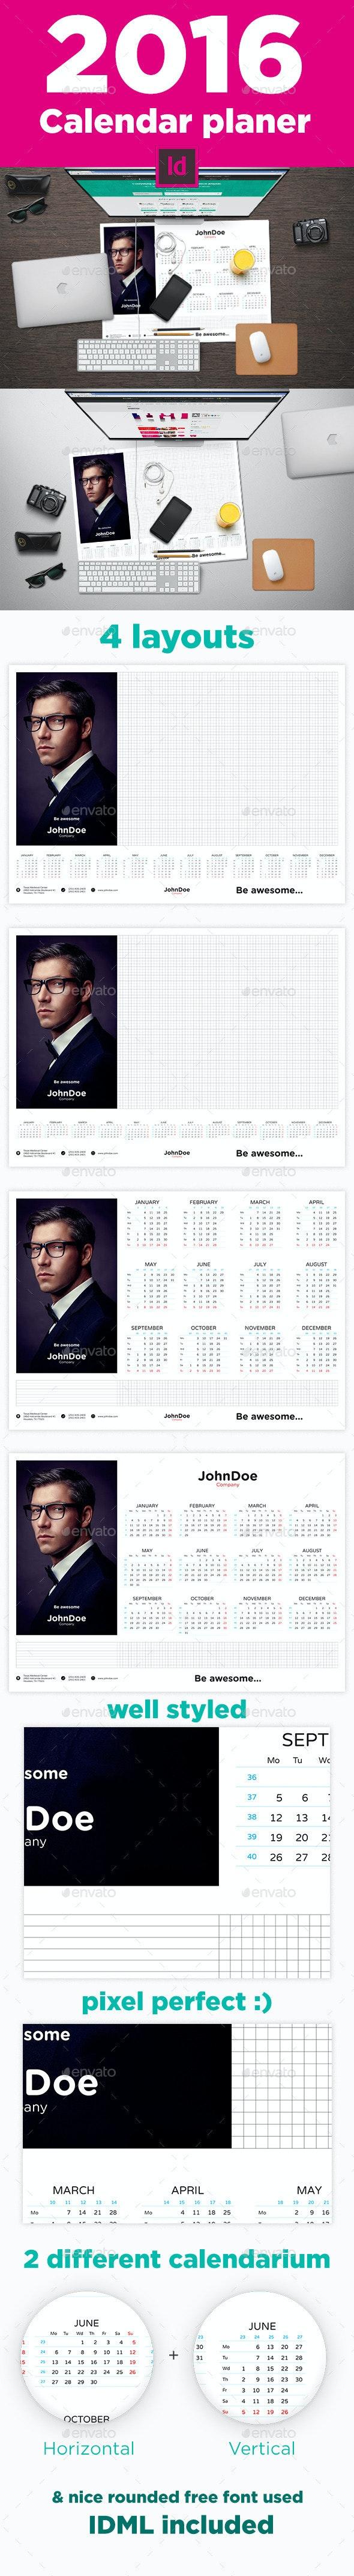 2016 Calendar Planer - Calendars Stationery